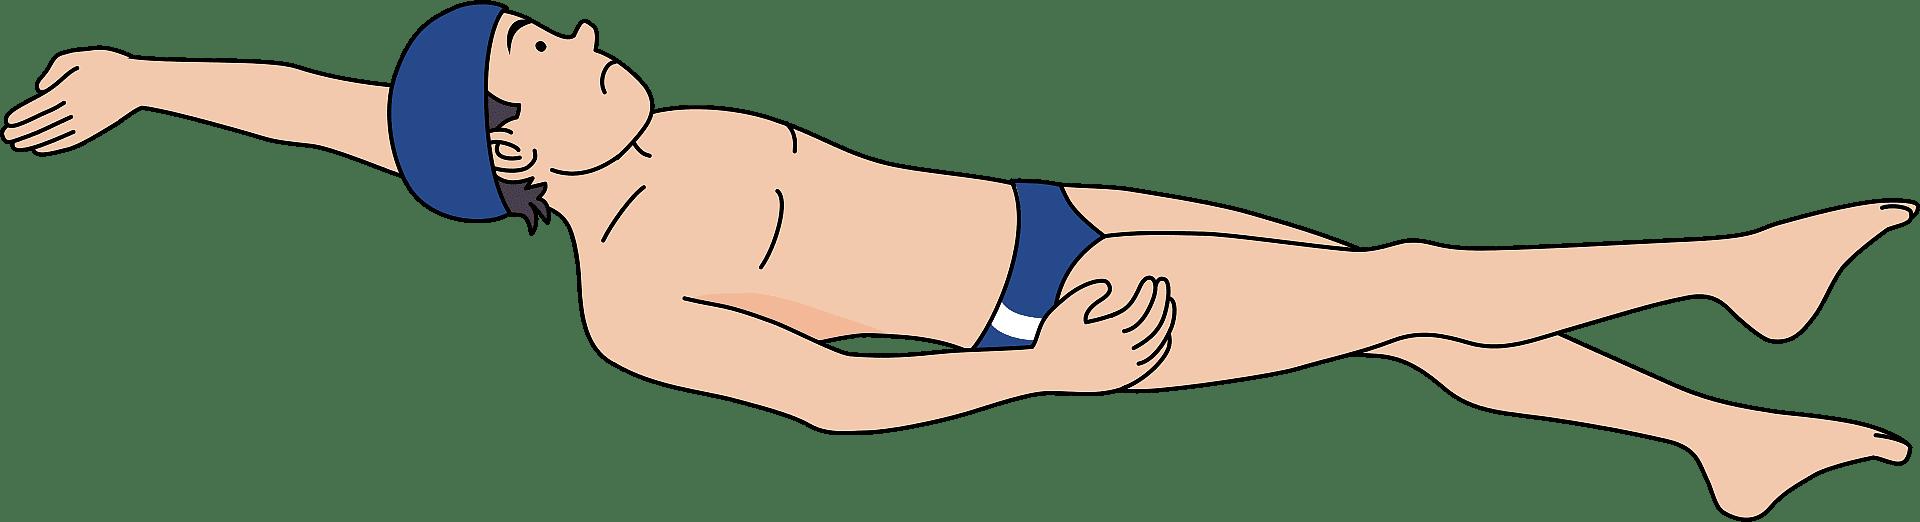 Swimming clipart transparent 8